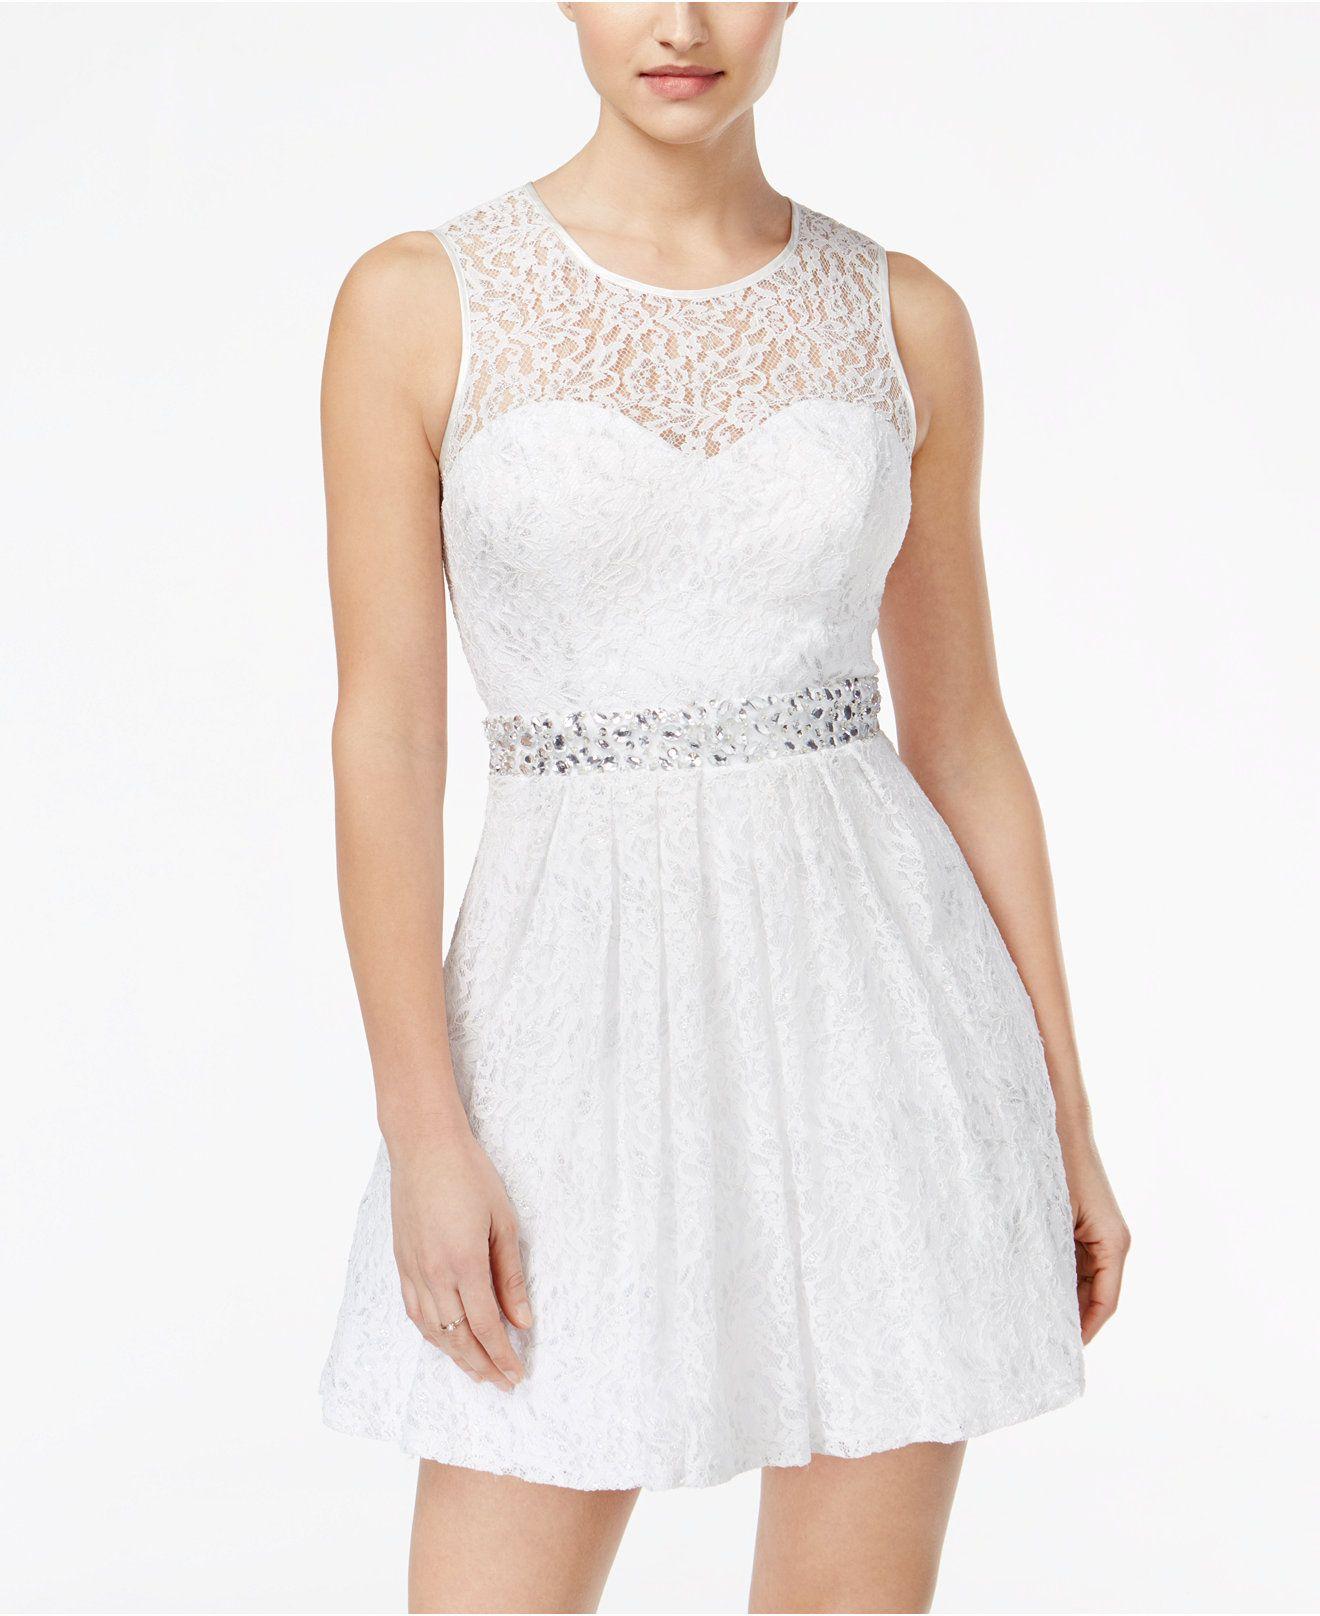 B Darlin Juniors  Jeweled Lace Fit   Flare Dress - Juniors Dresses - Macy s edbd99a0d